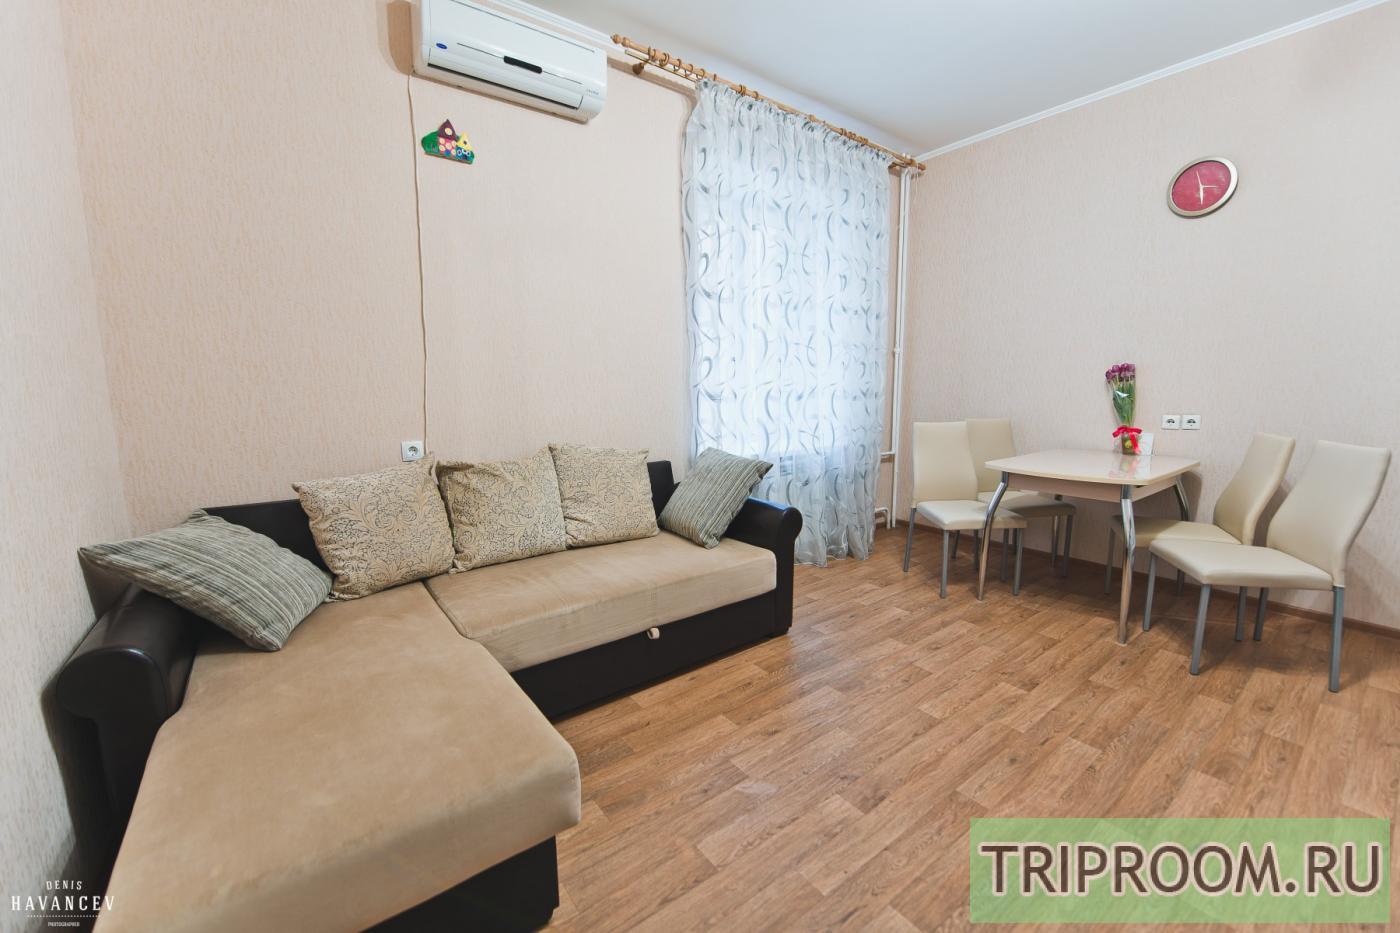 1-комнатная квартира посуточно (вариант № 14832), ул. Пугачева улица, фото № 2